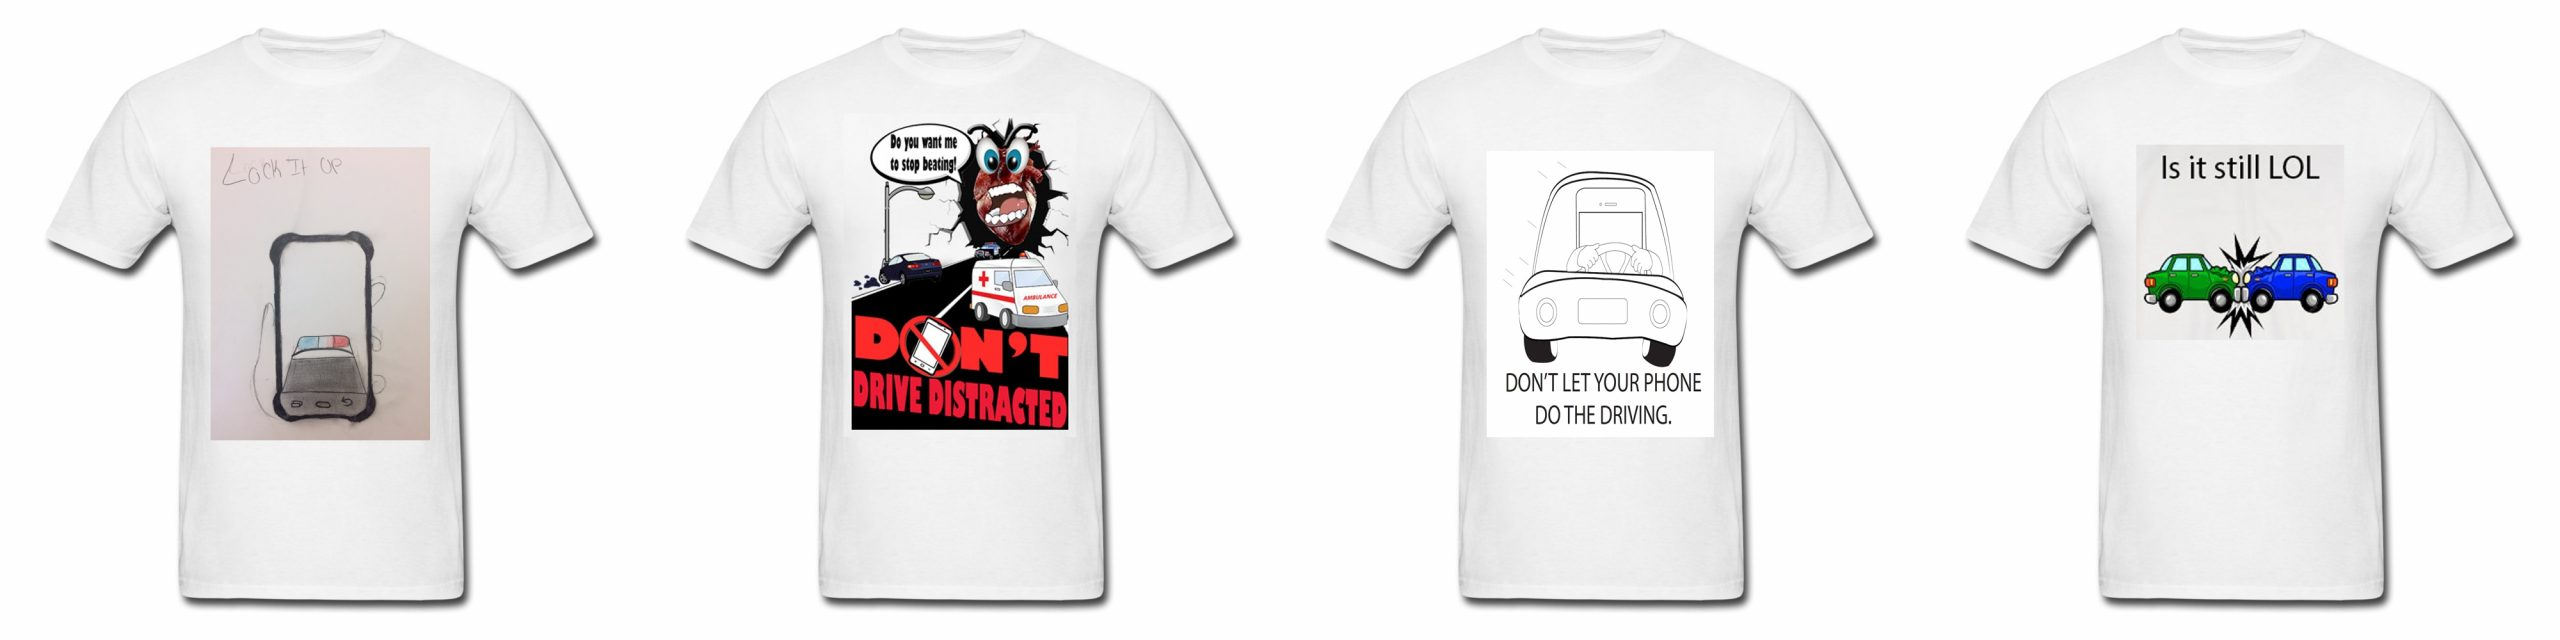 Nebraska State Patrol T-Shirt Design, Voting Open Now